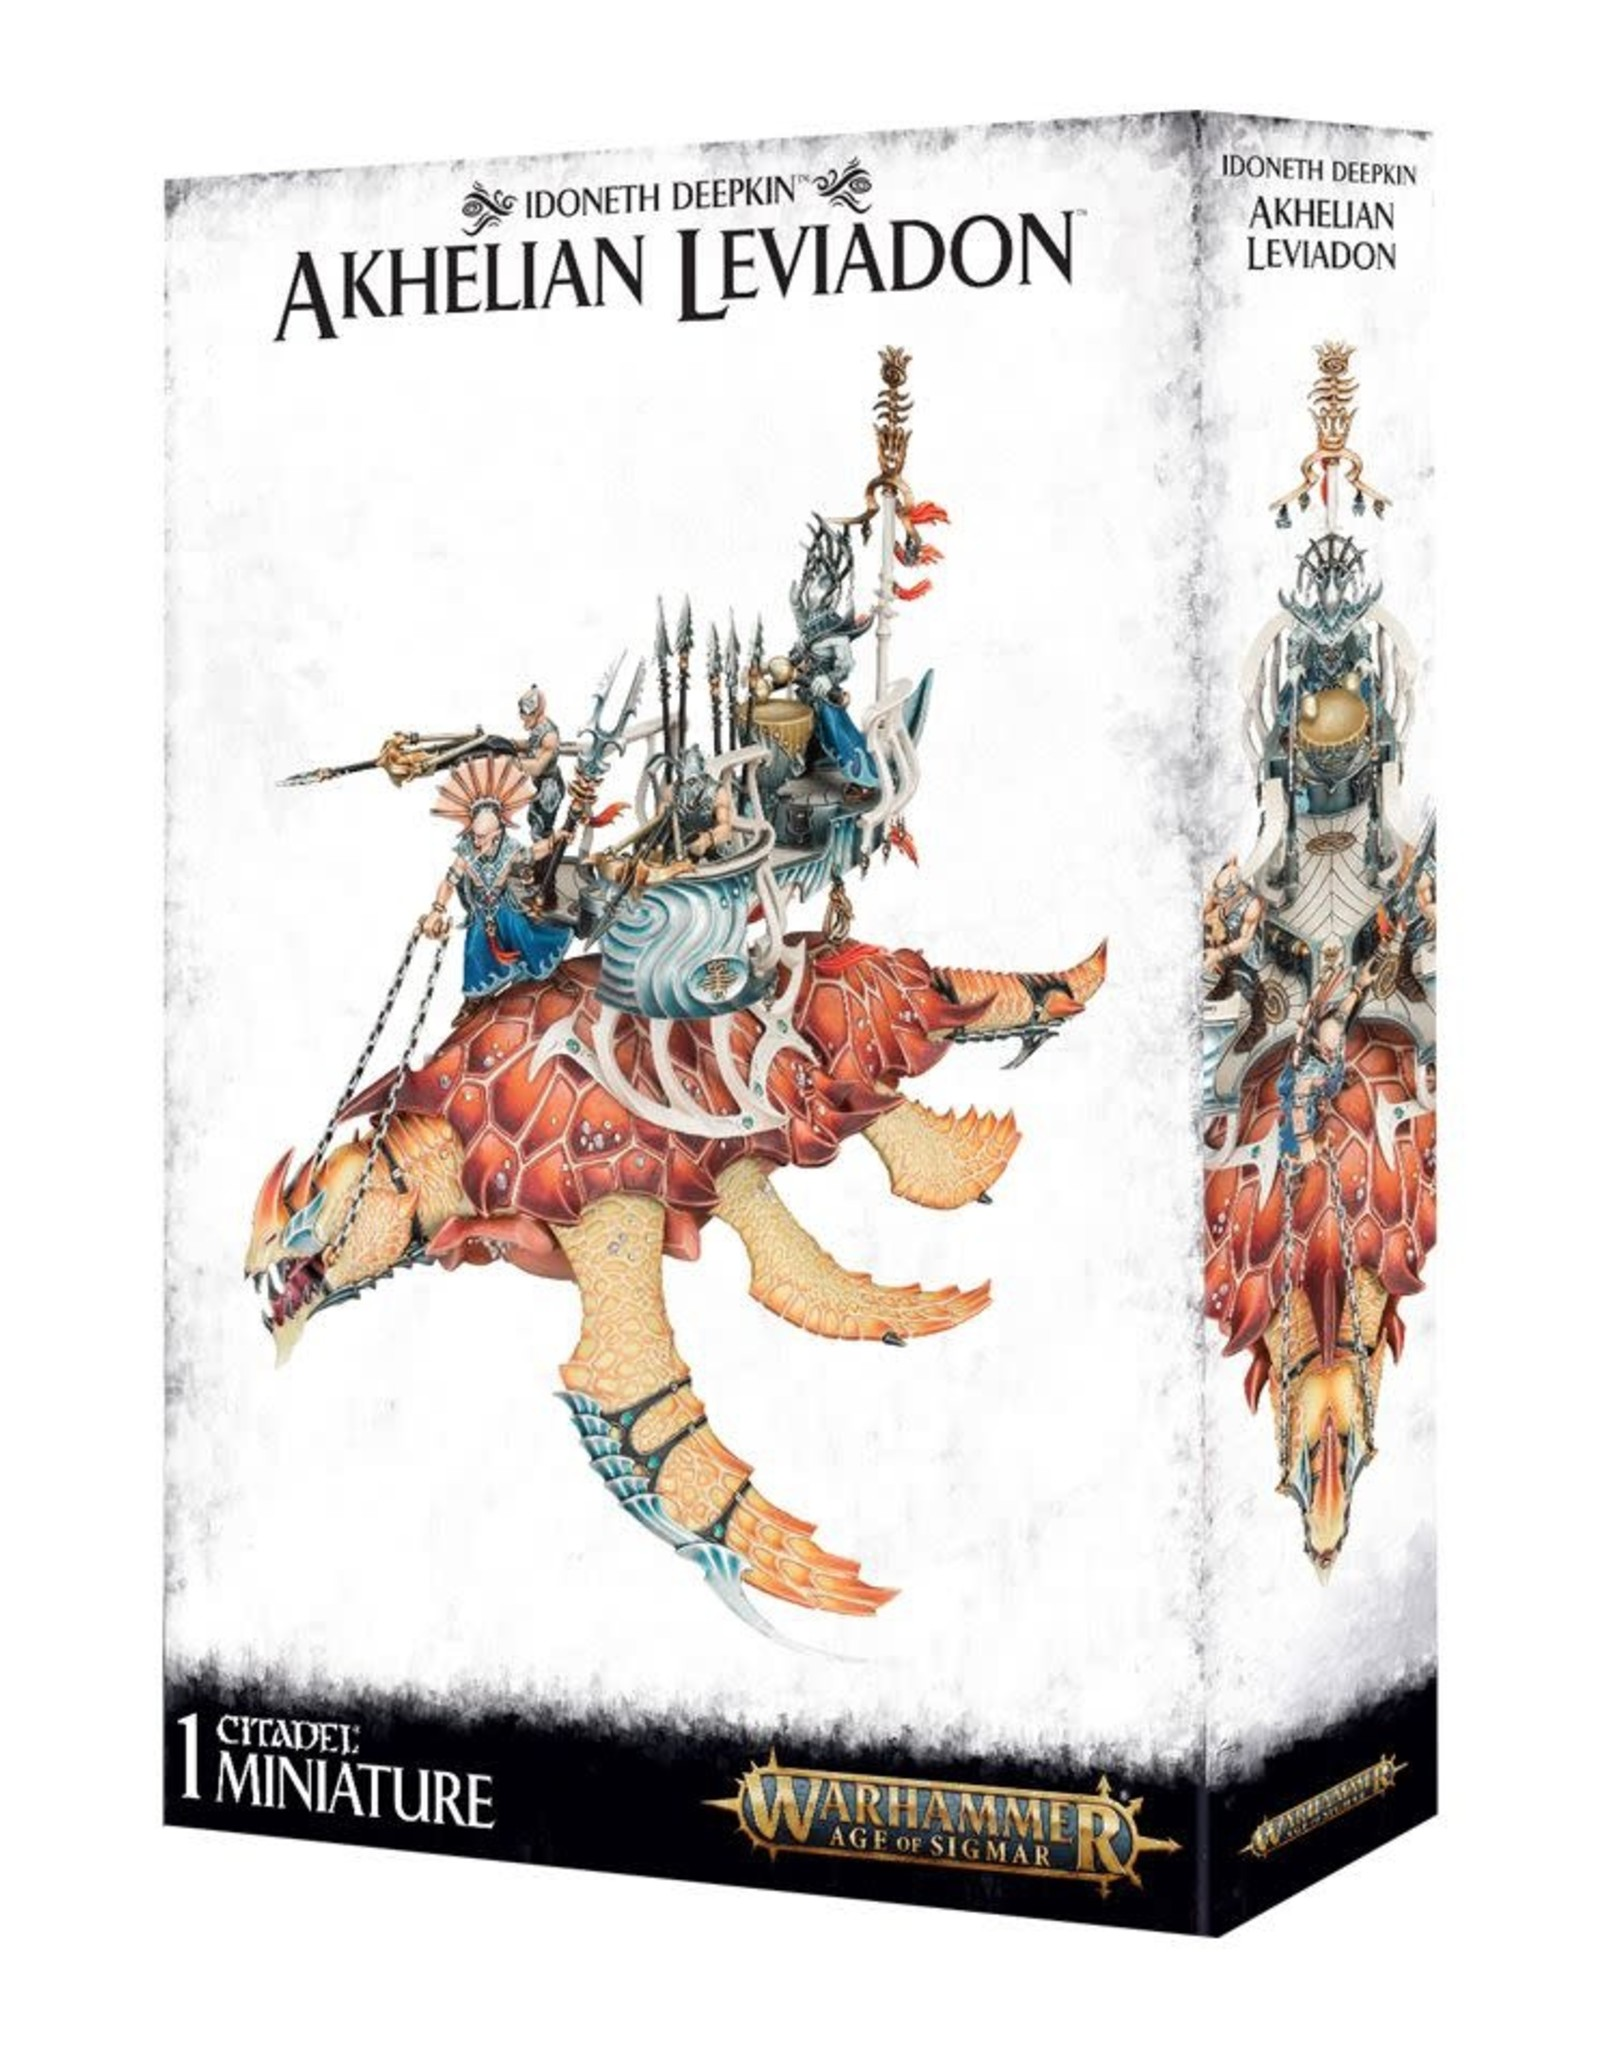 Age of Sigmar Idoneth Deepkin Akhelian Leviadon